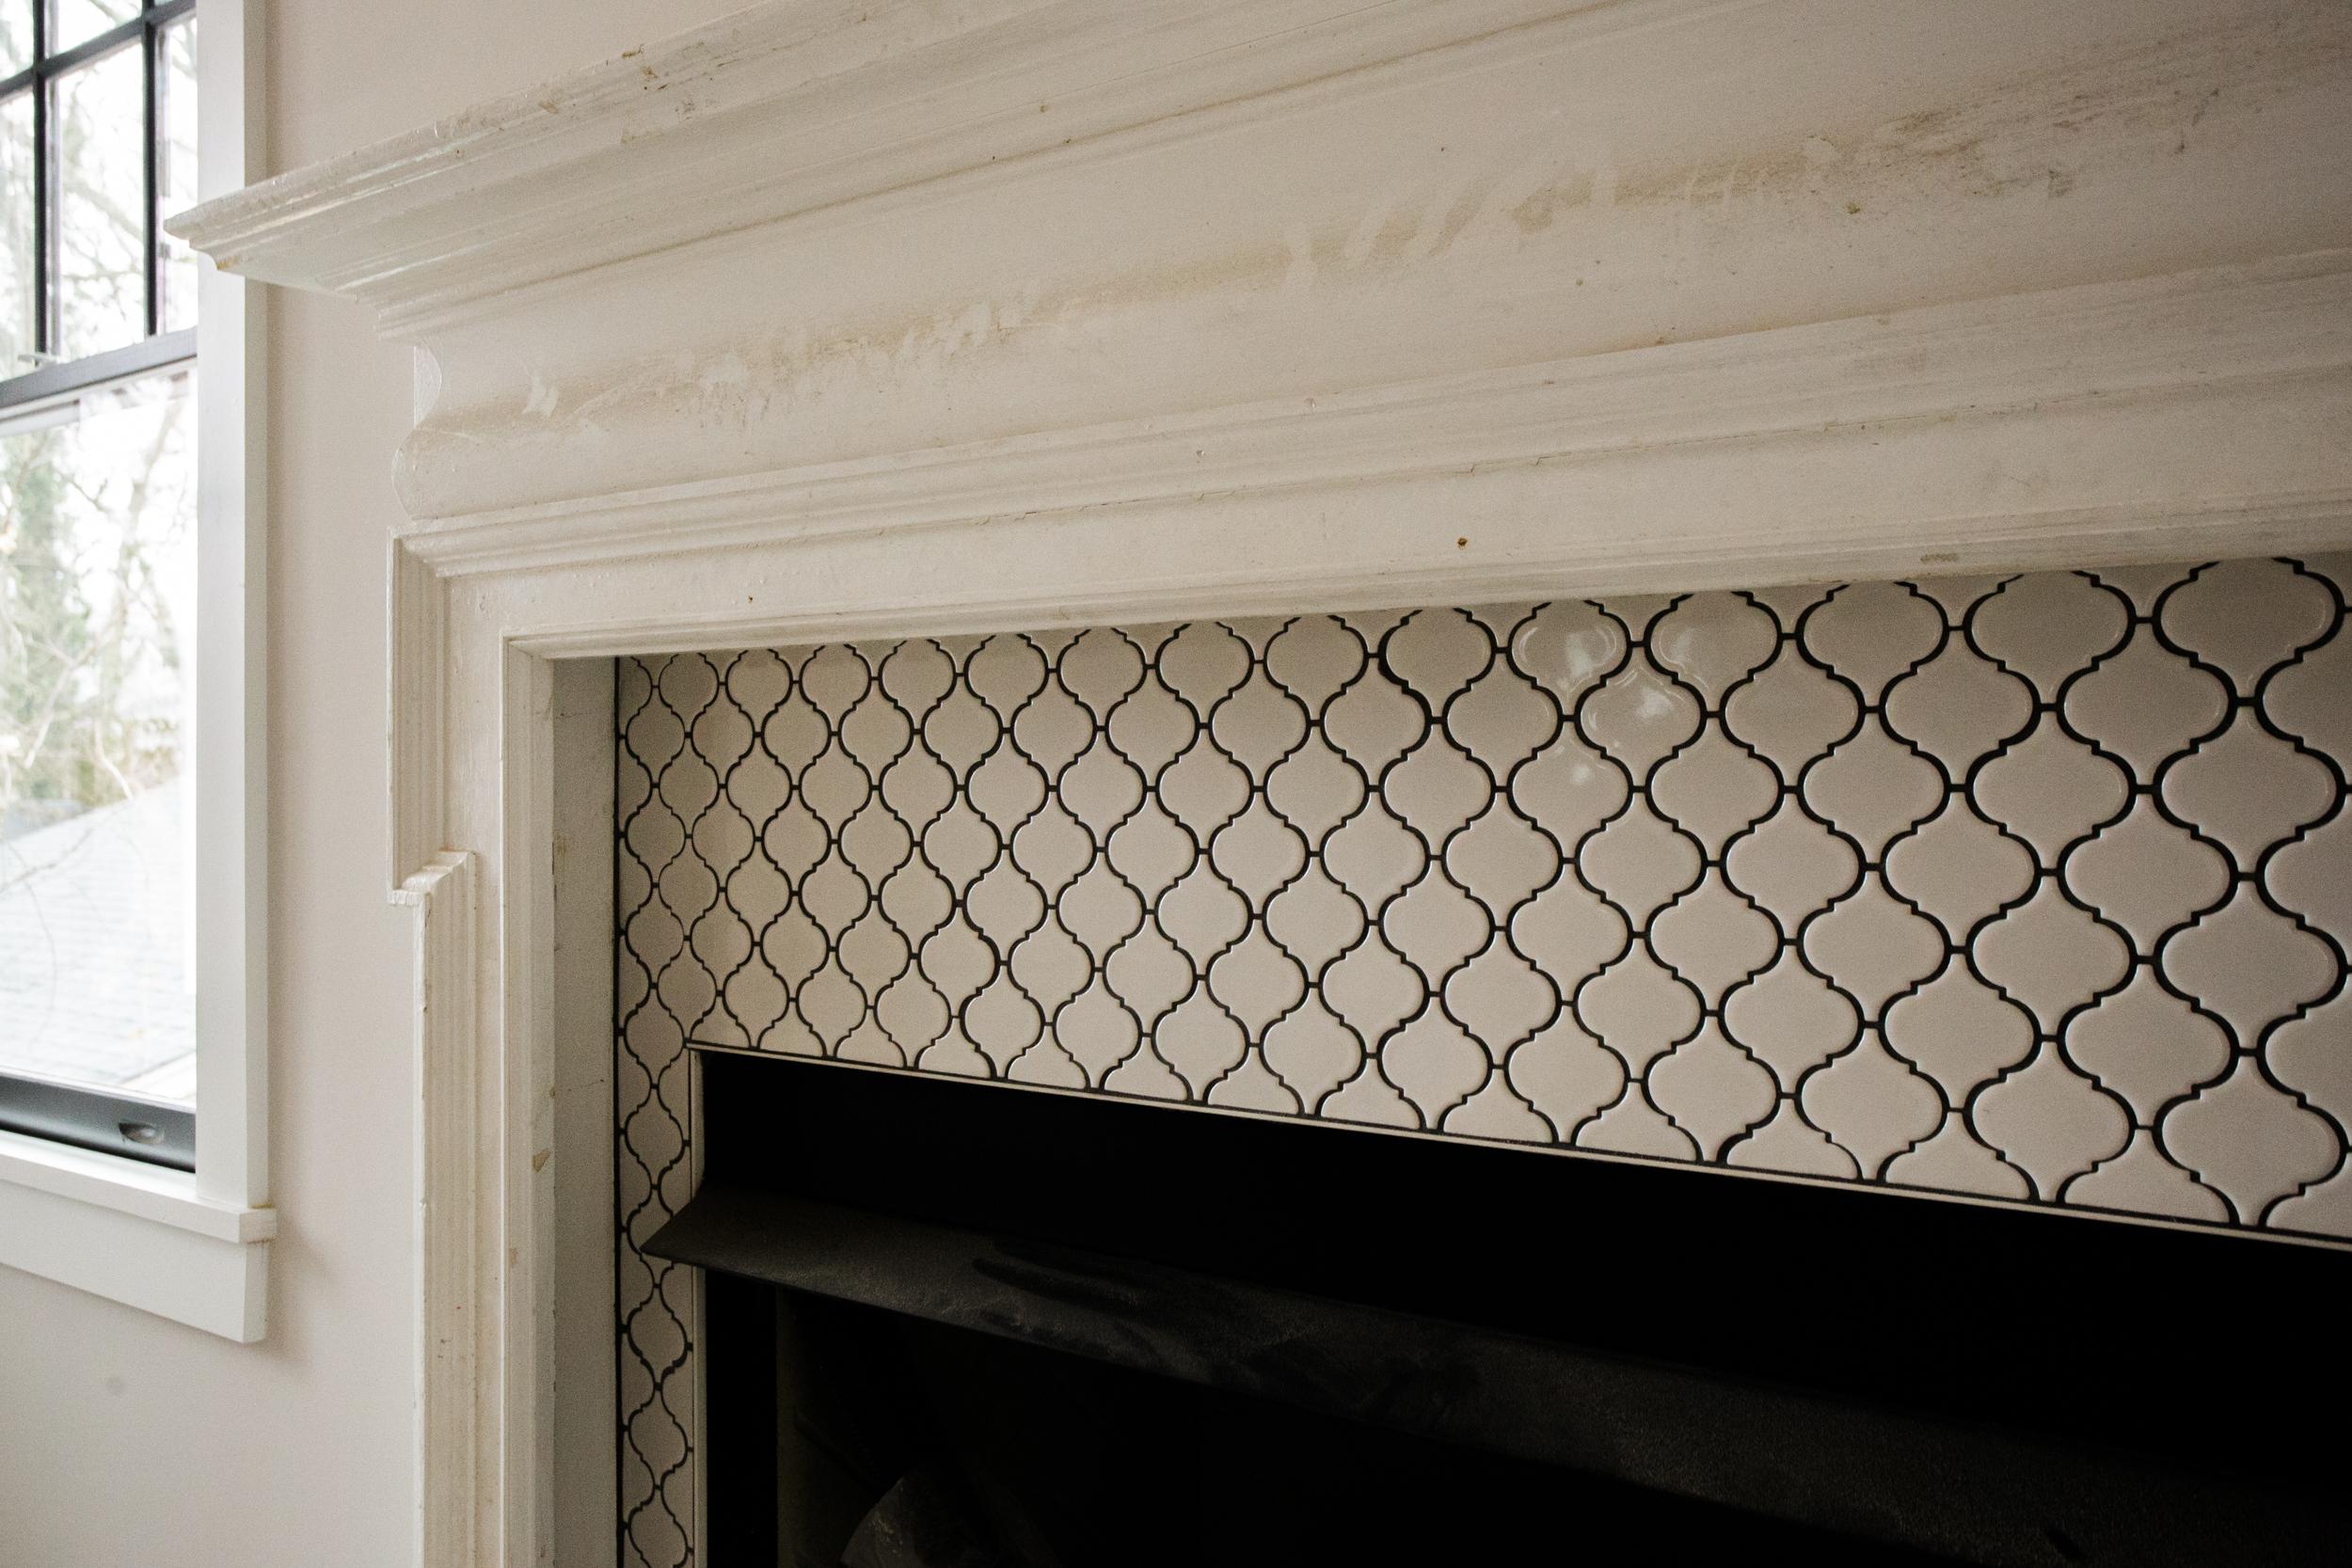 britt-development-group-nashville-tennessee-custom-home-builder-historic-restoration-0799.jpg